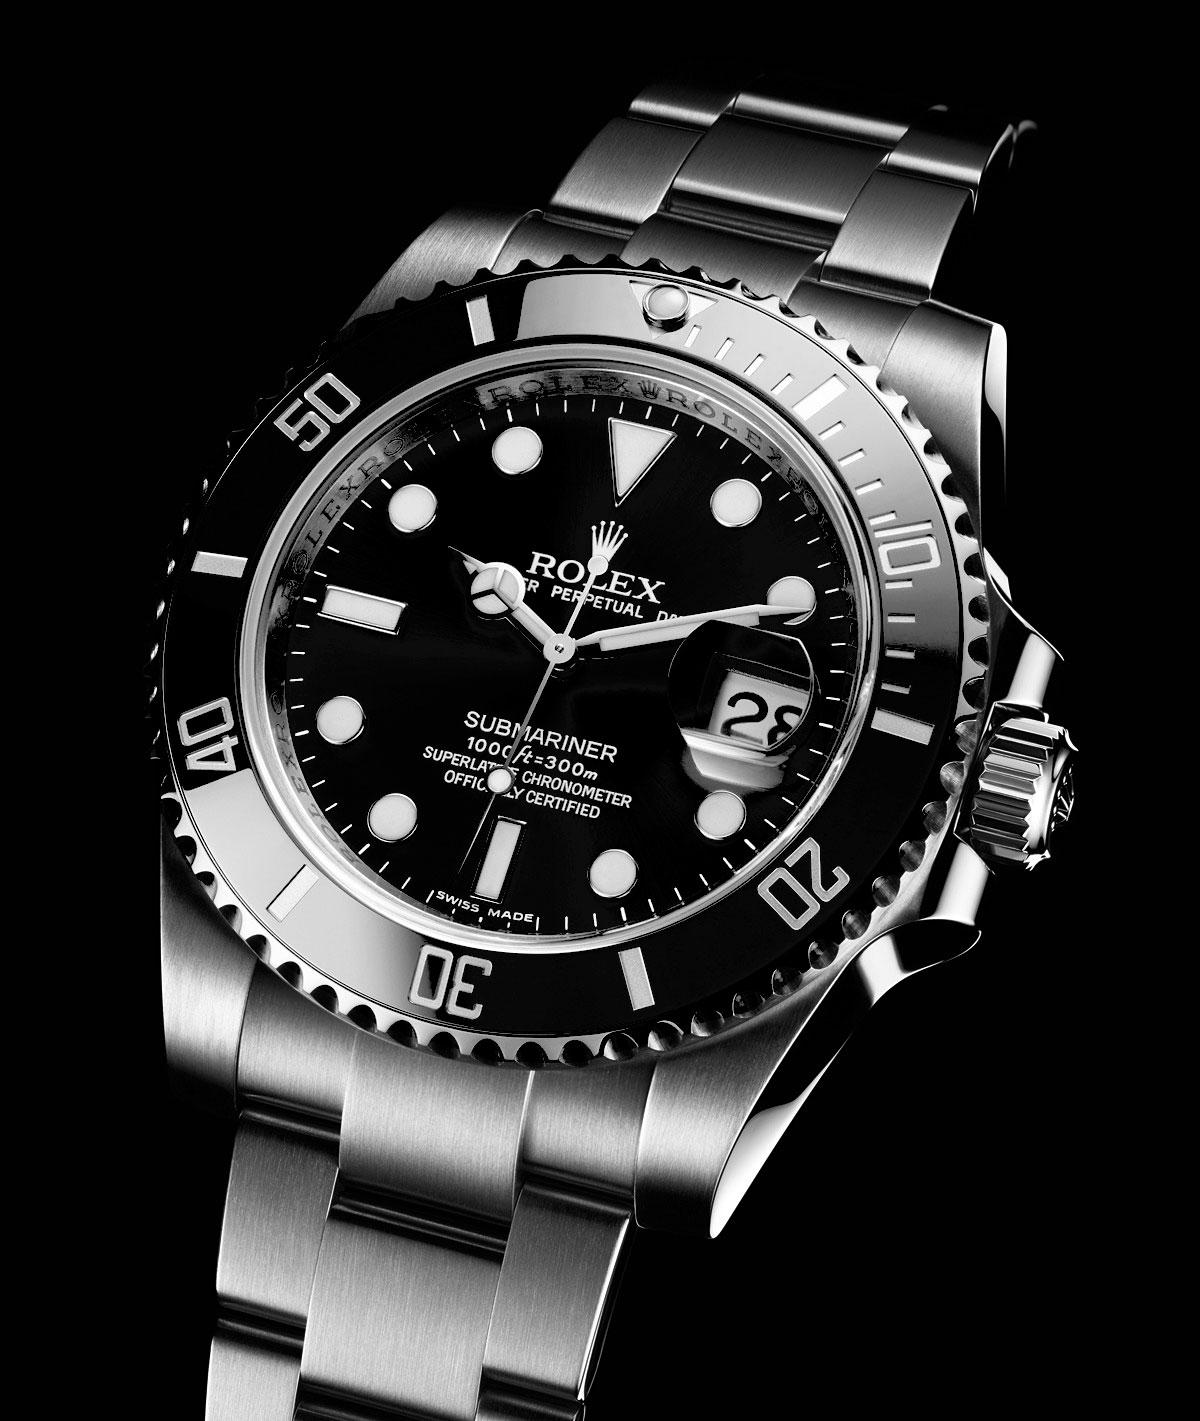 https://4.bp.blogspot.com/_Cv-0TBEhWVE/S6FIPnI61mI/AAAAAAAAH34/8ZvxPiwyWp8/s1600/New-Black-Submariner-2010-Basel.jpg